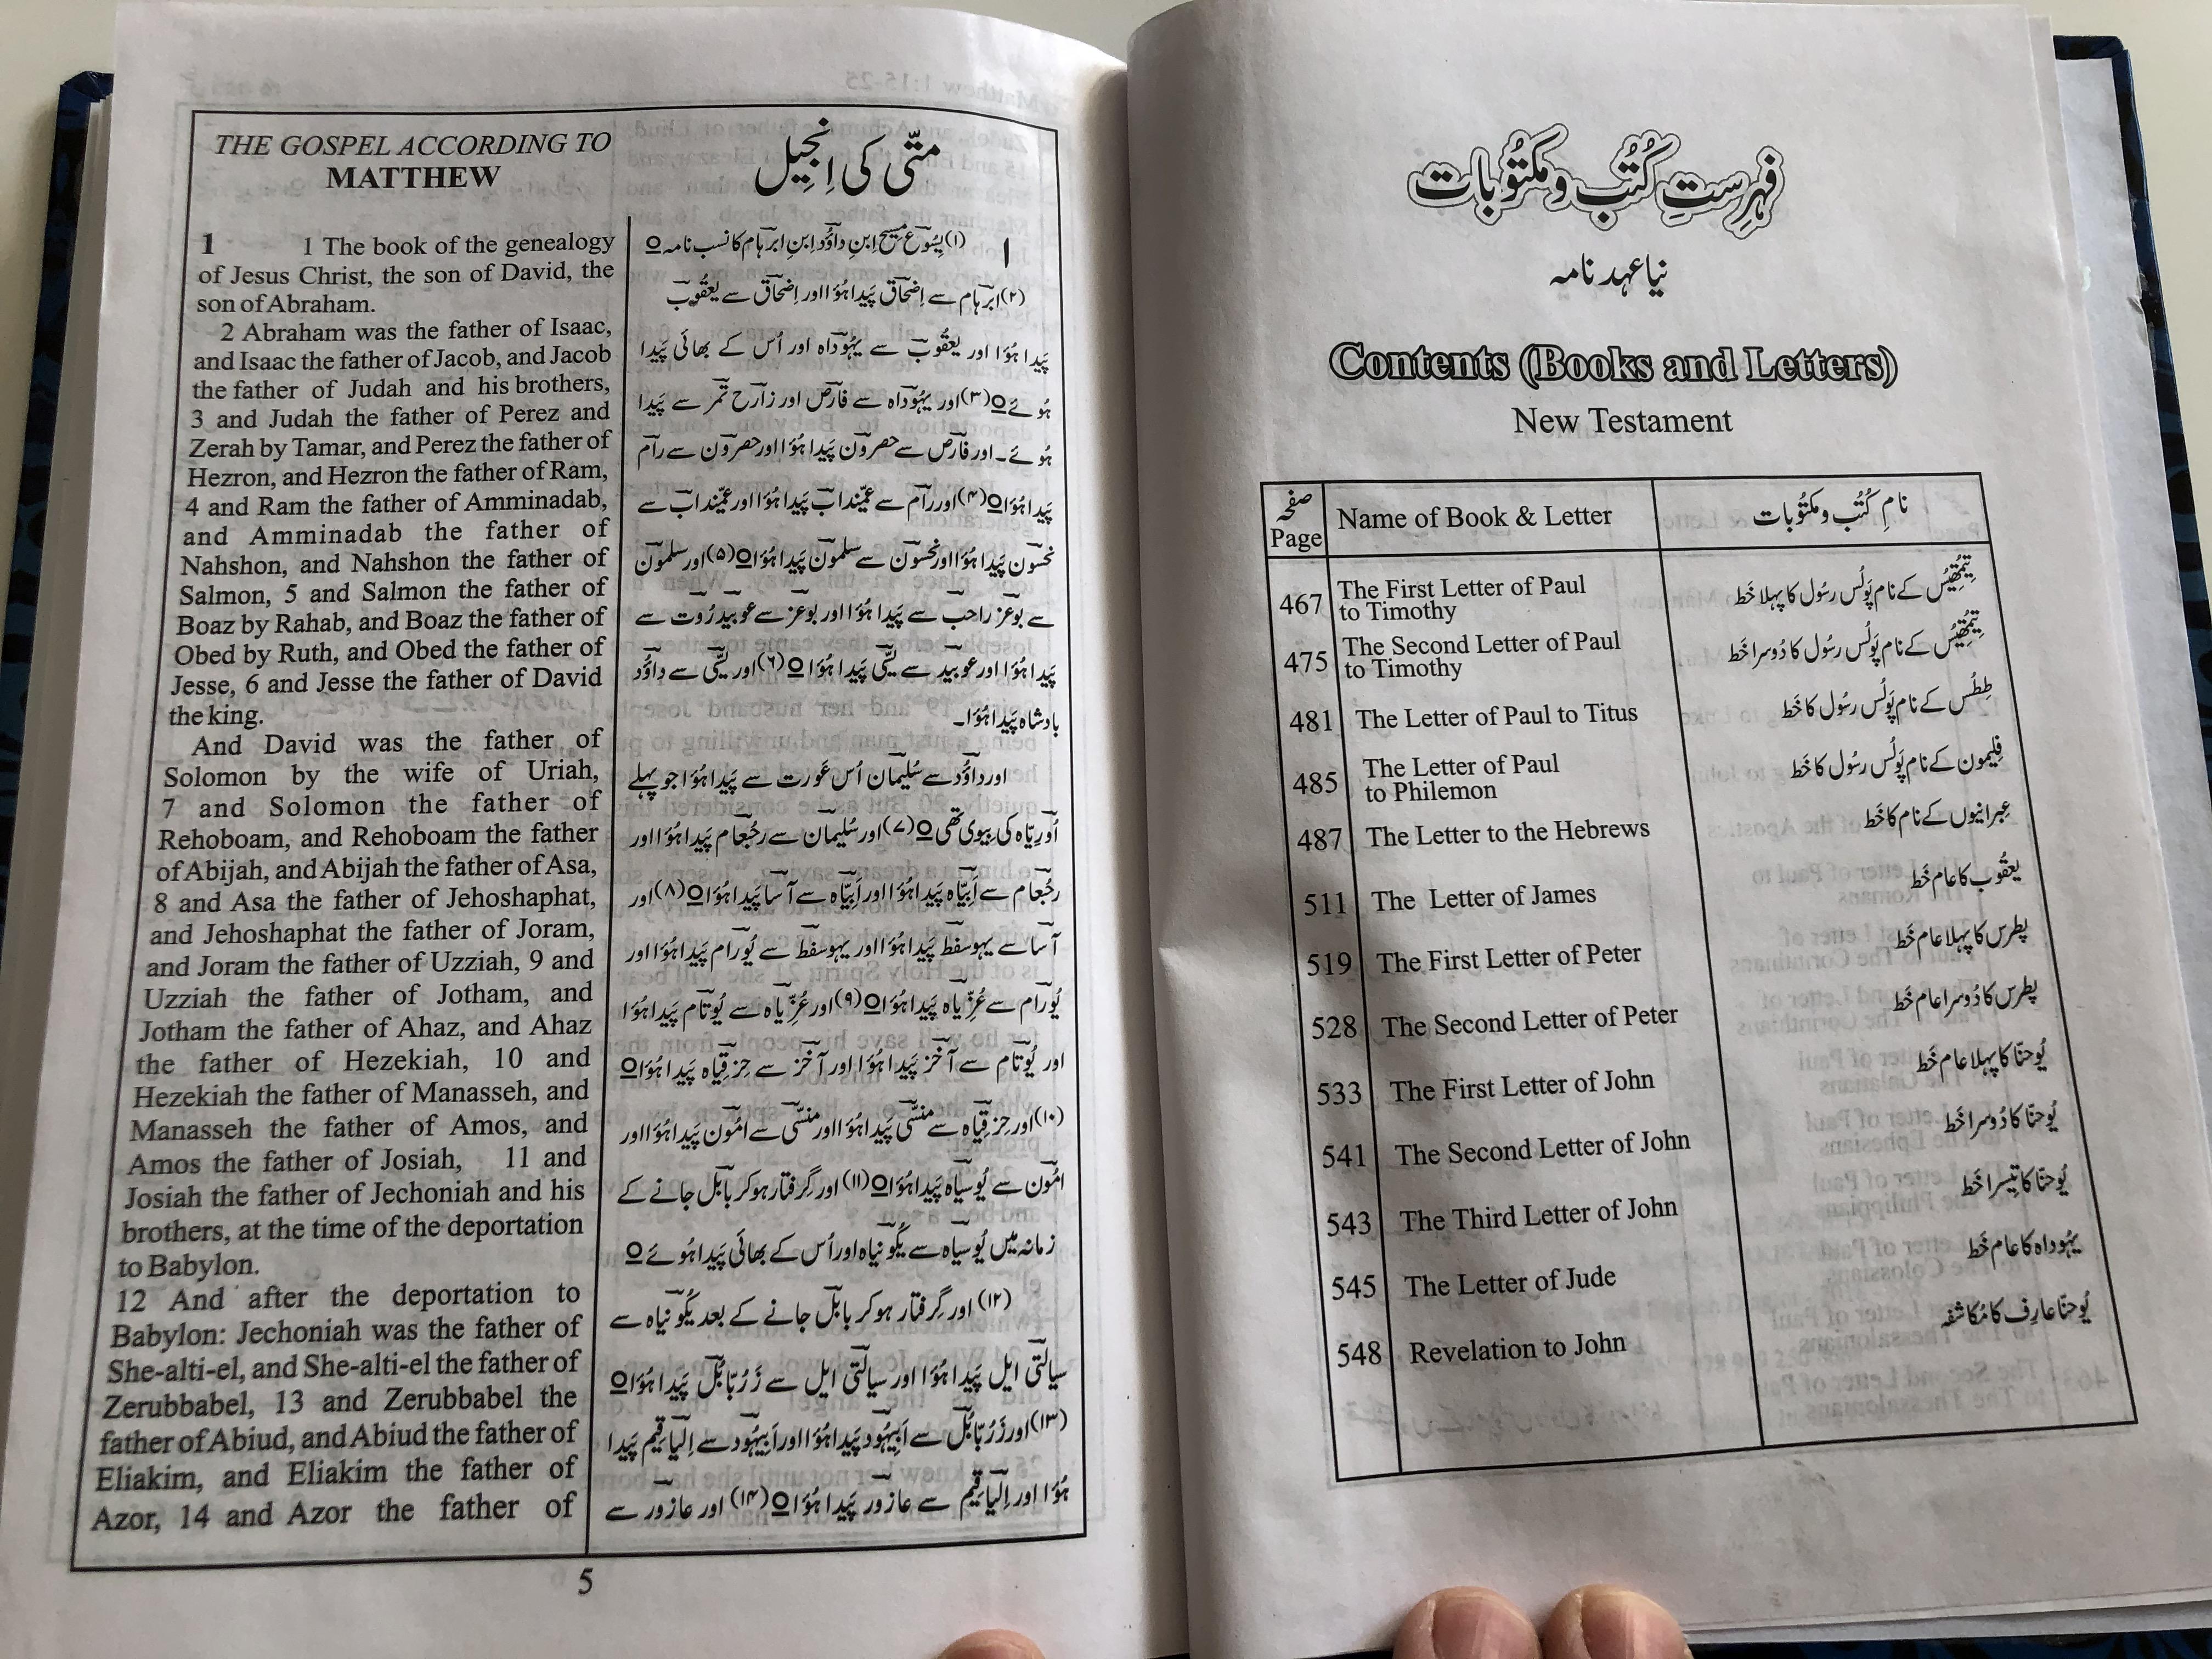 english-urdu-diaglot-bilingual-new-testament-6-.jpg